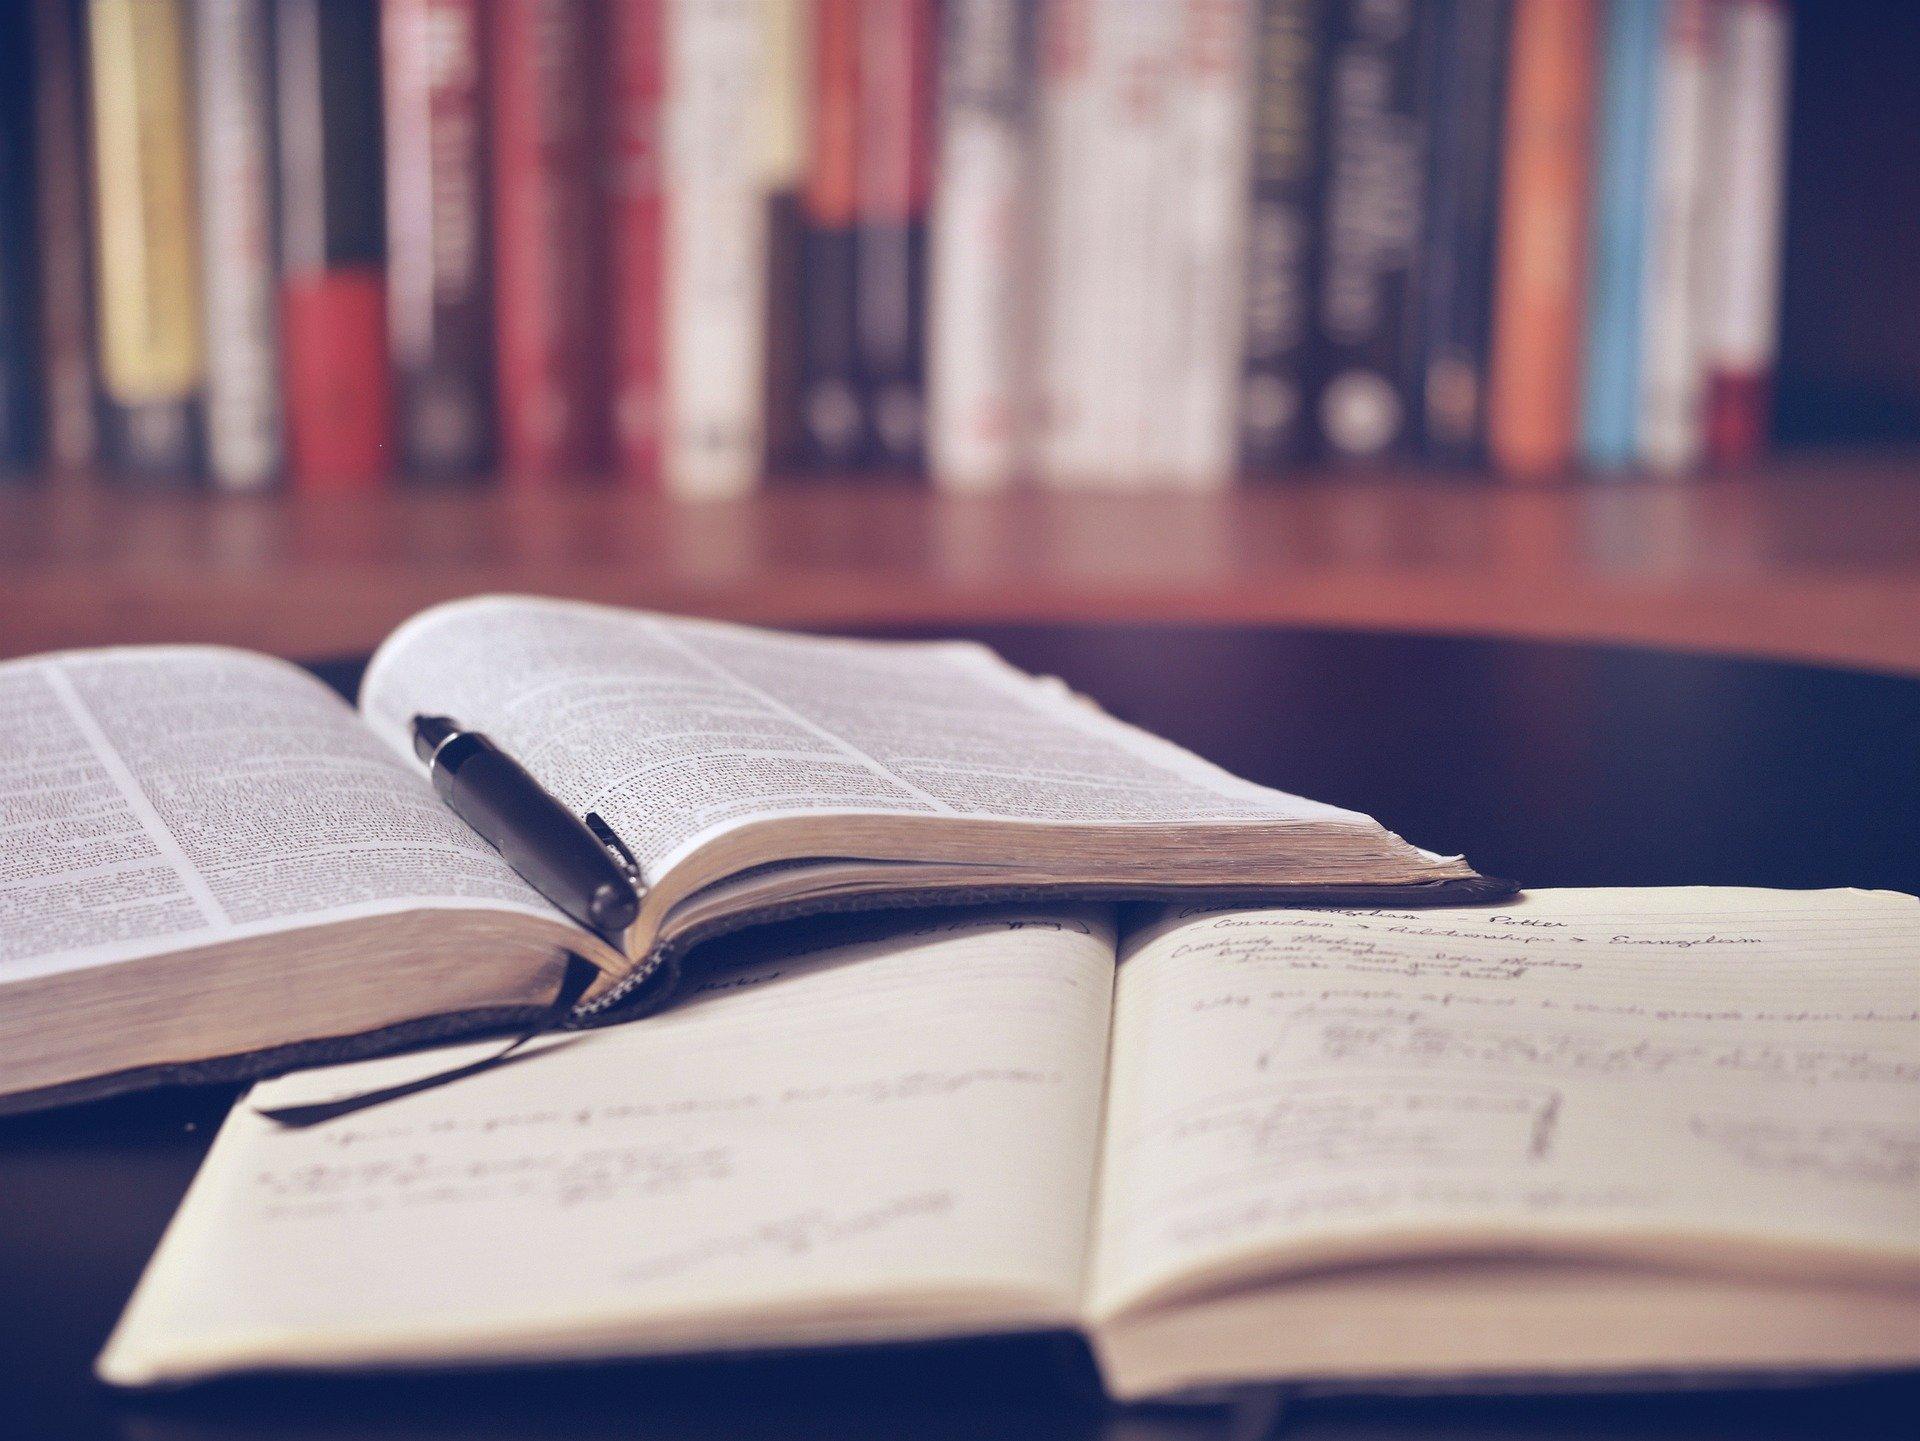 libro abierto, notas, bolígrafo